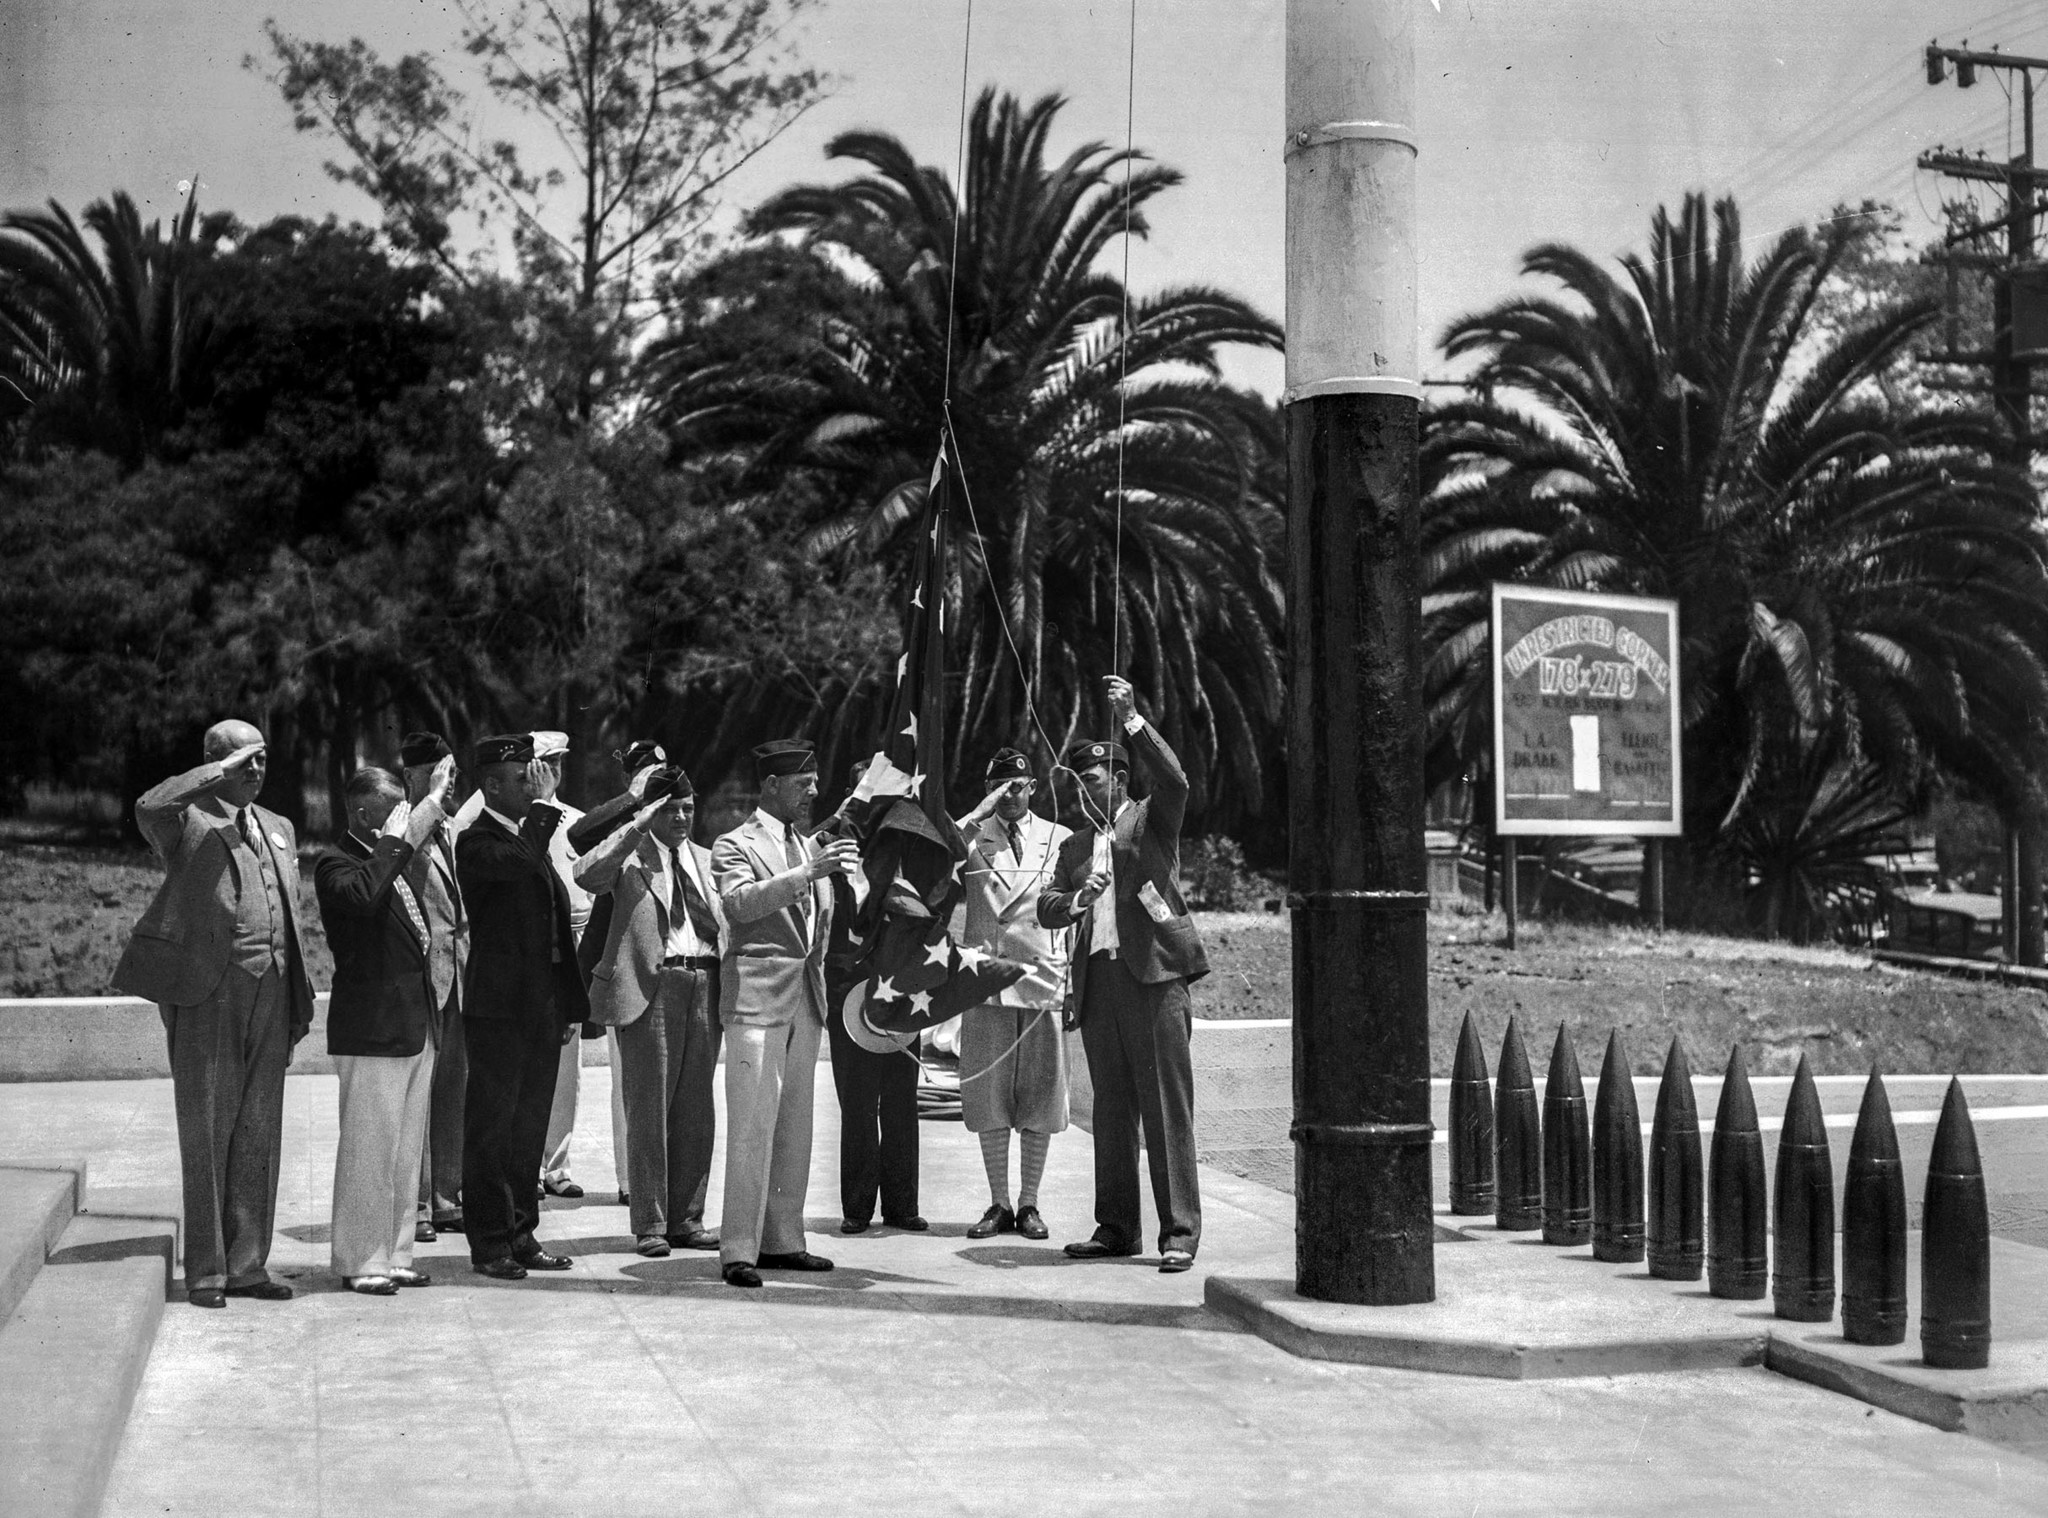 July 4, 1929: Flag raising at American Legion Post dedication in Hollywood. July 4, 1929.